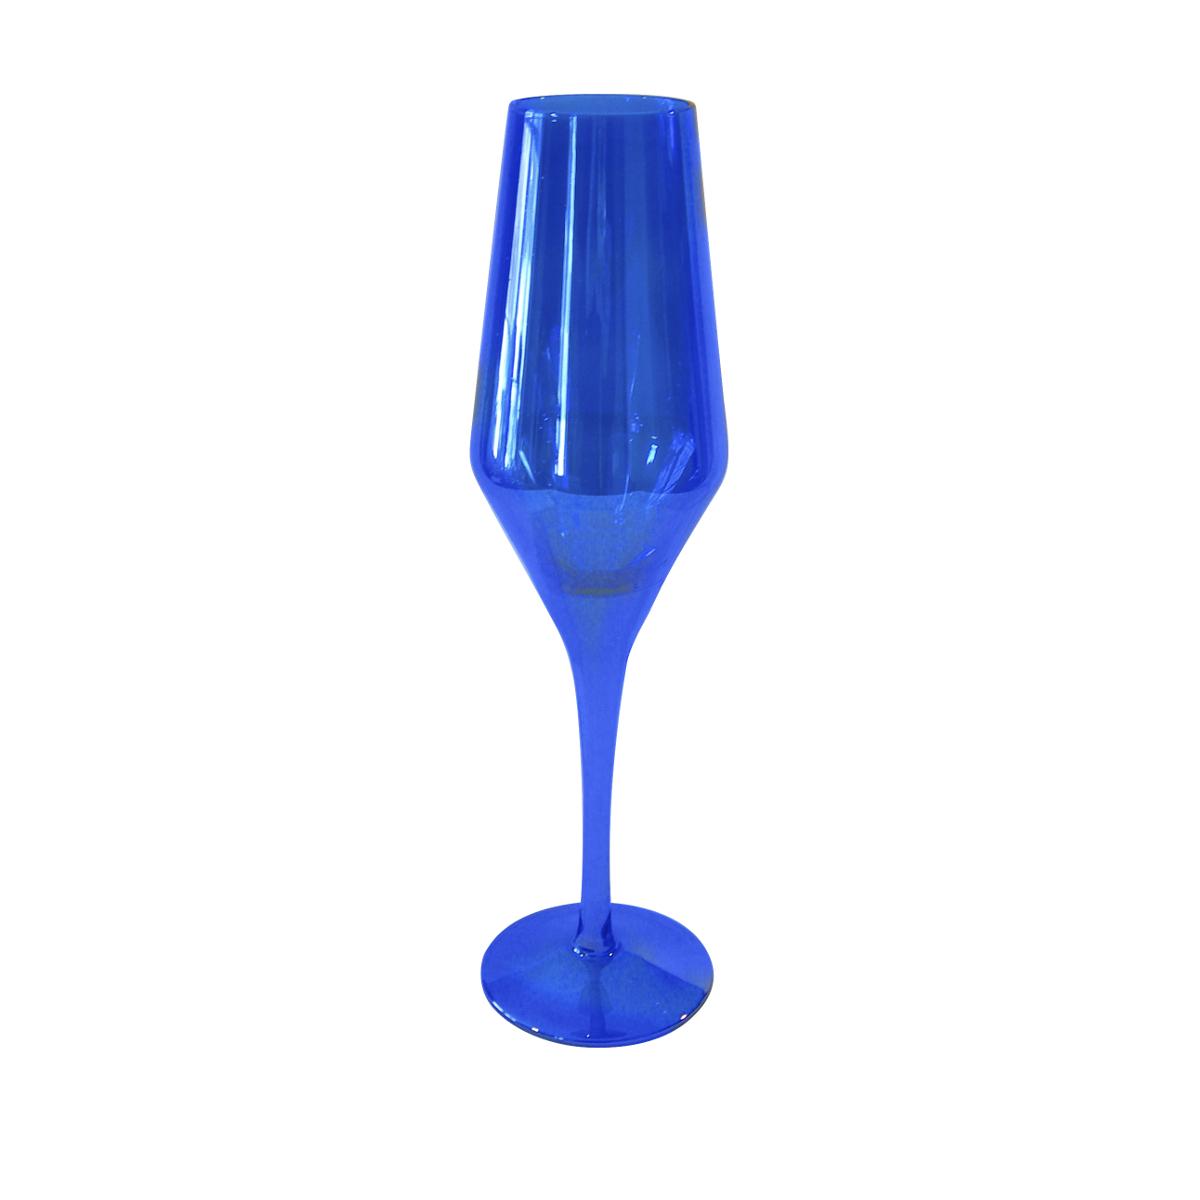 Artland Luster Blue Glass 8 Ounce Flute